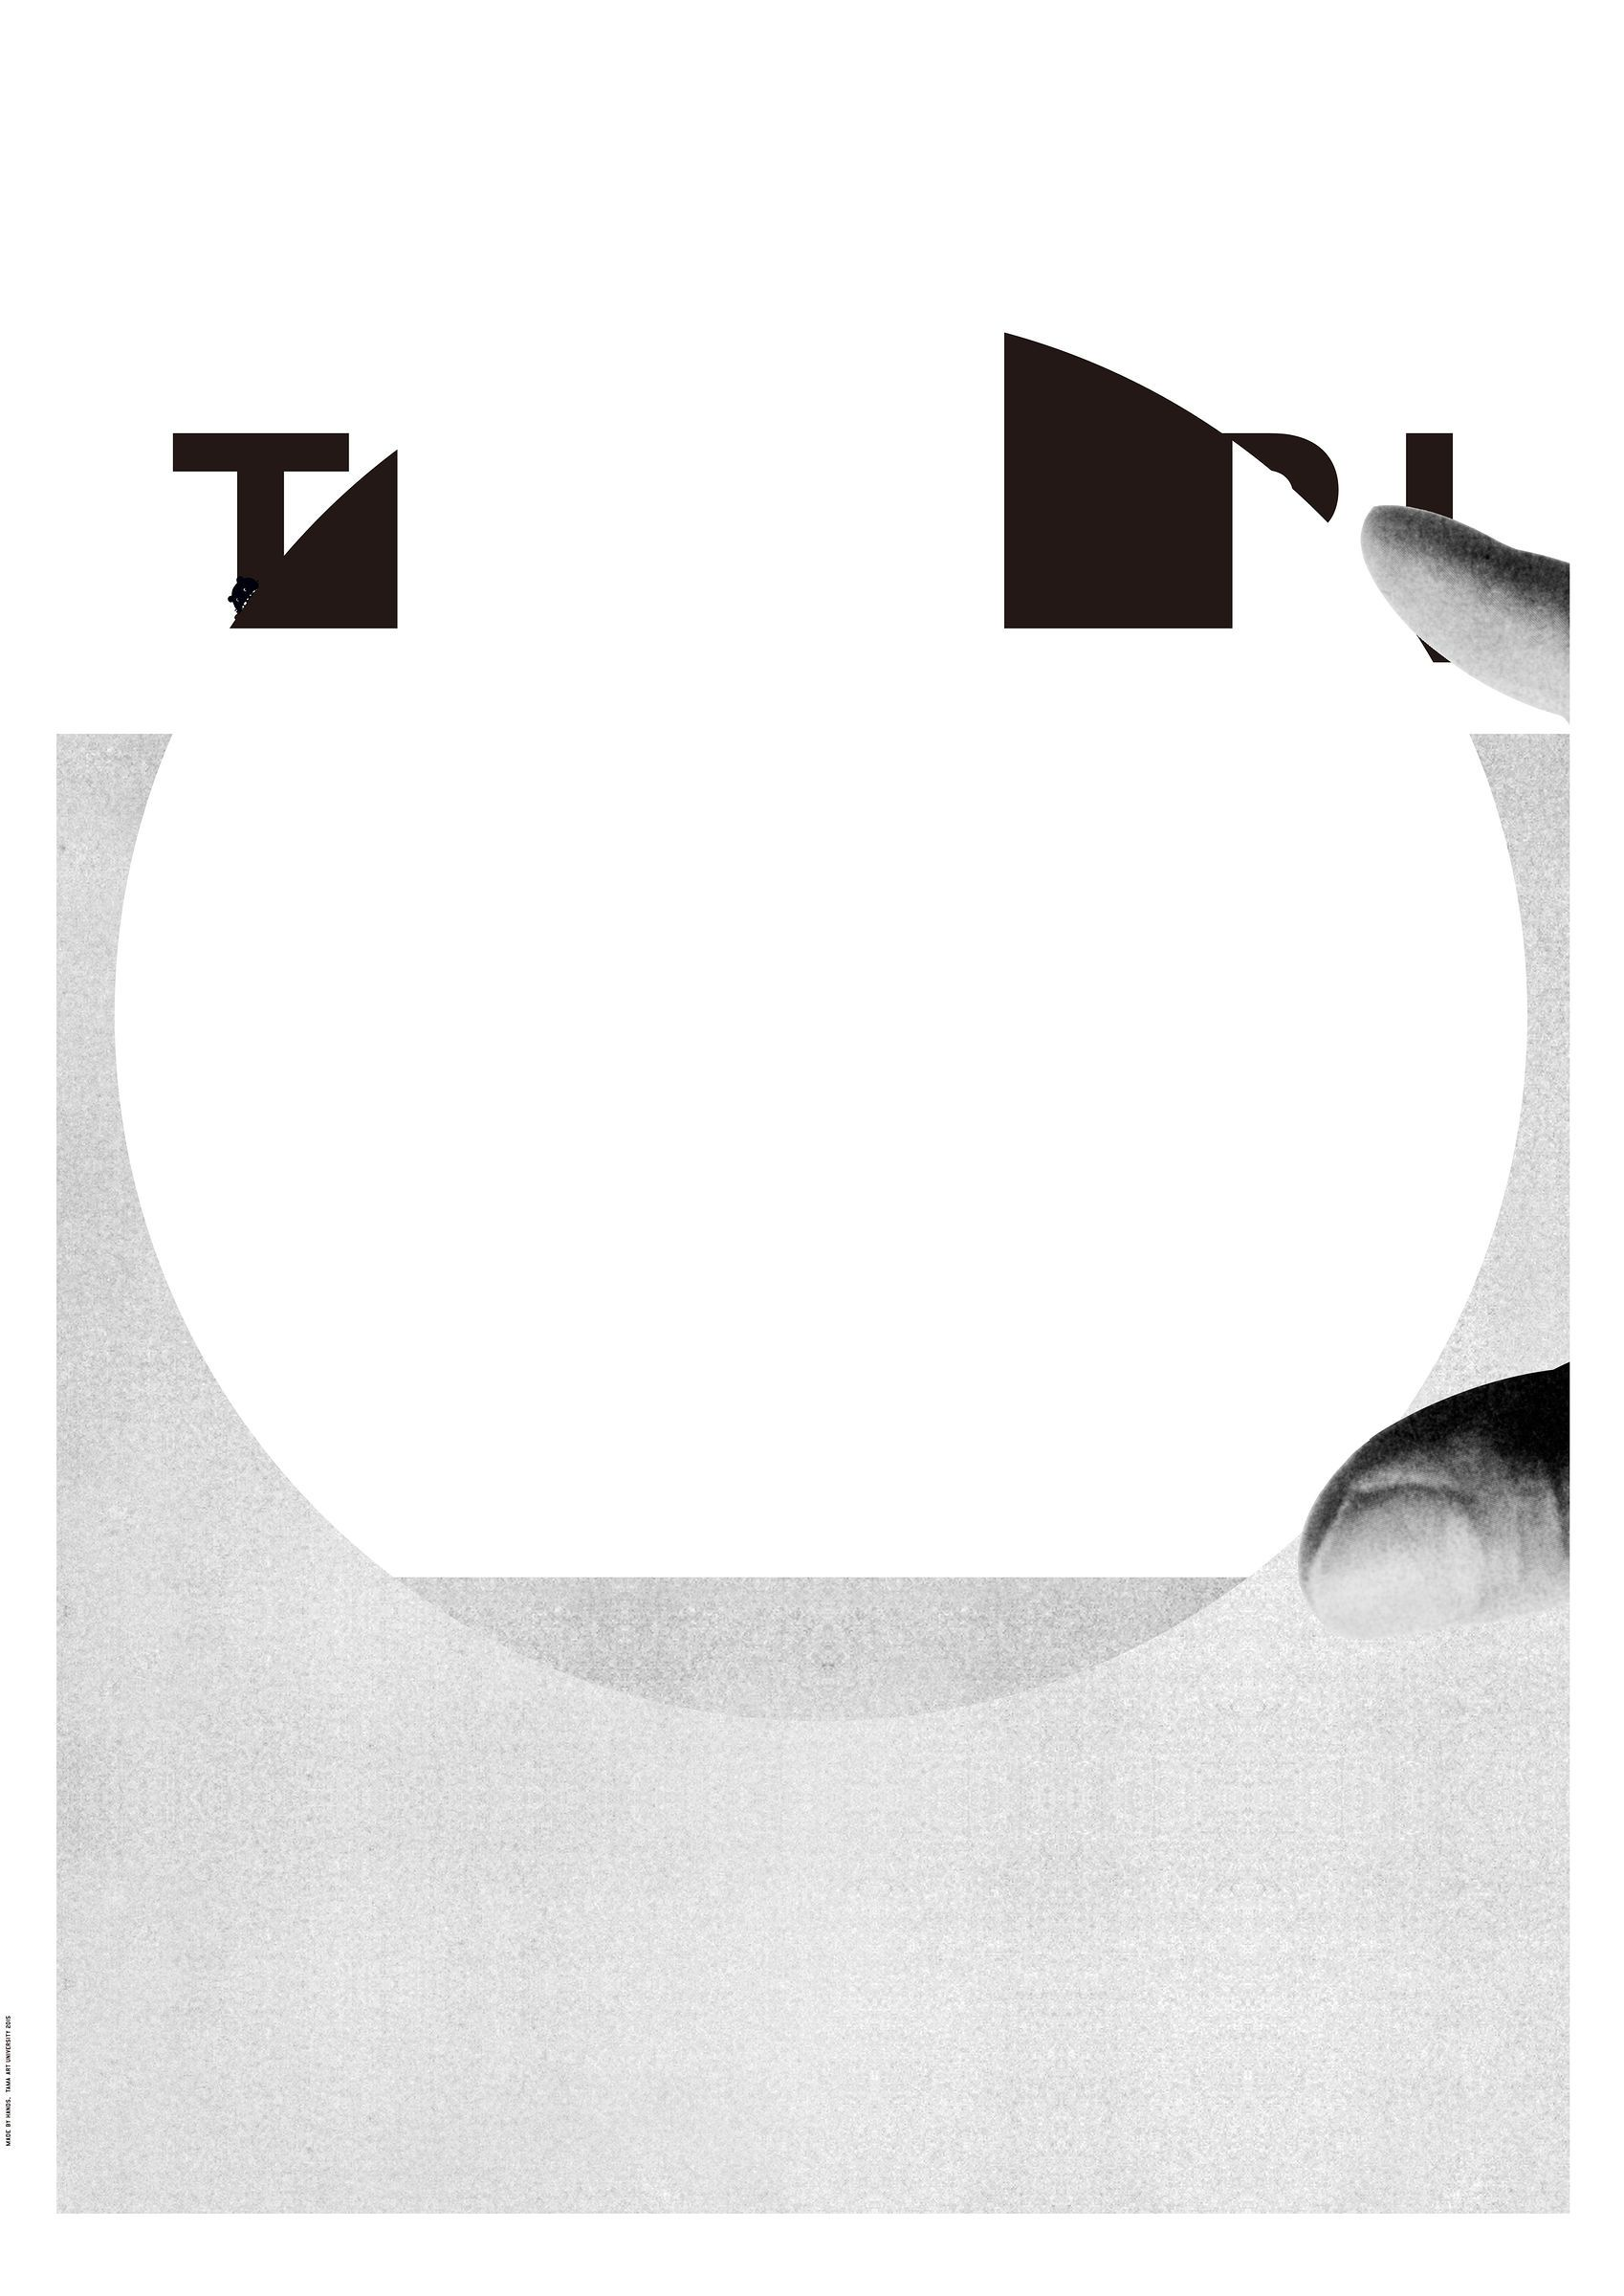 Poster design monochrome - Tamabi Tama Art University Monochrome Photography Illustration And Graphic Design Advertising Posters Award